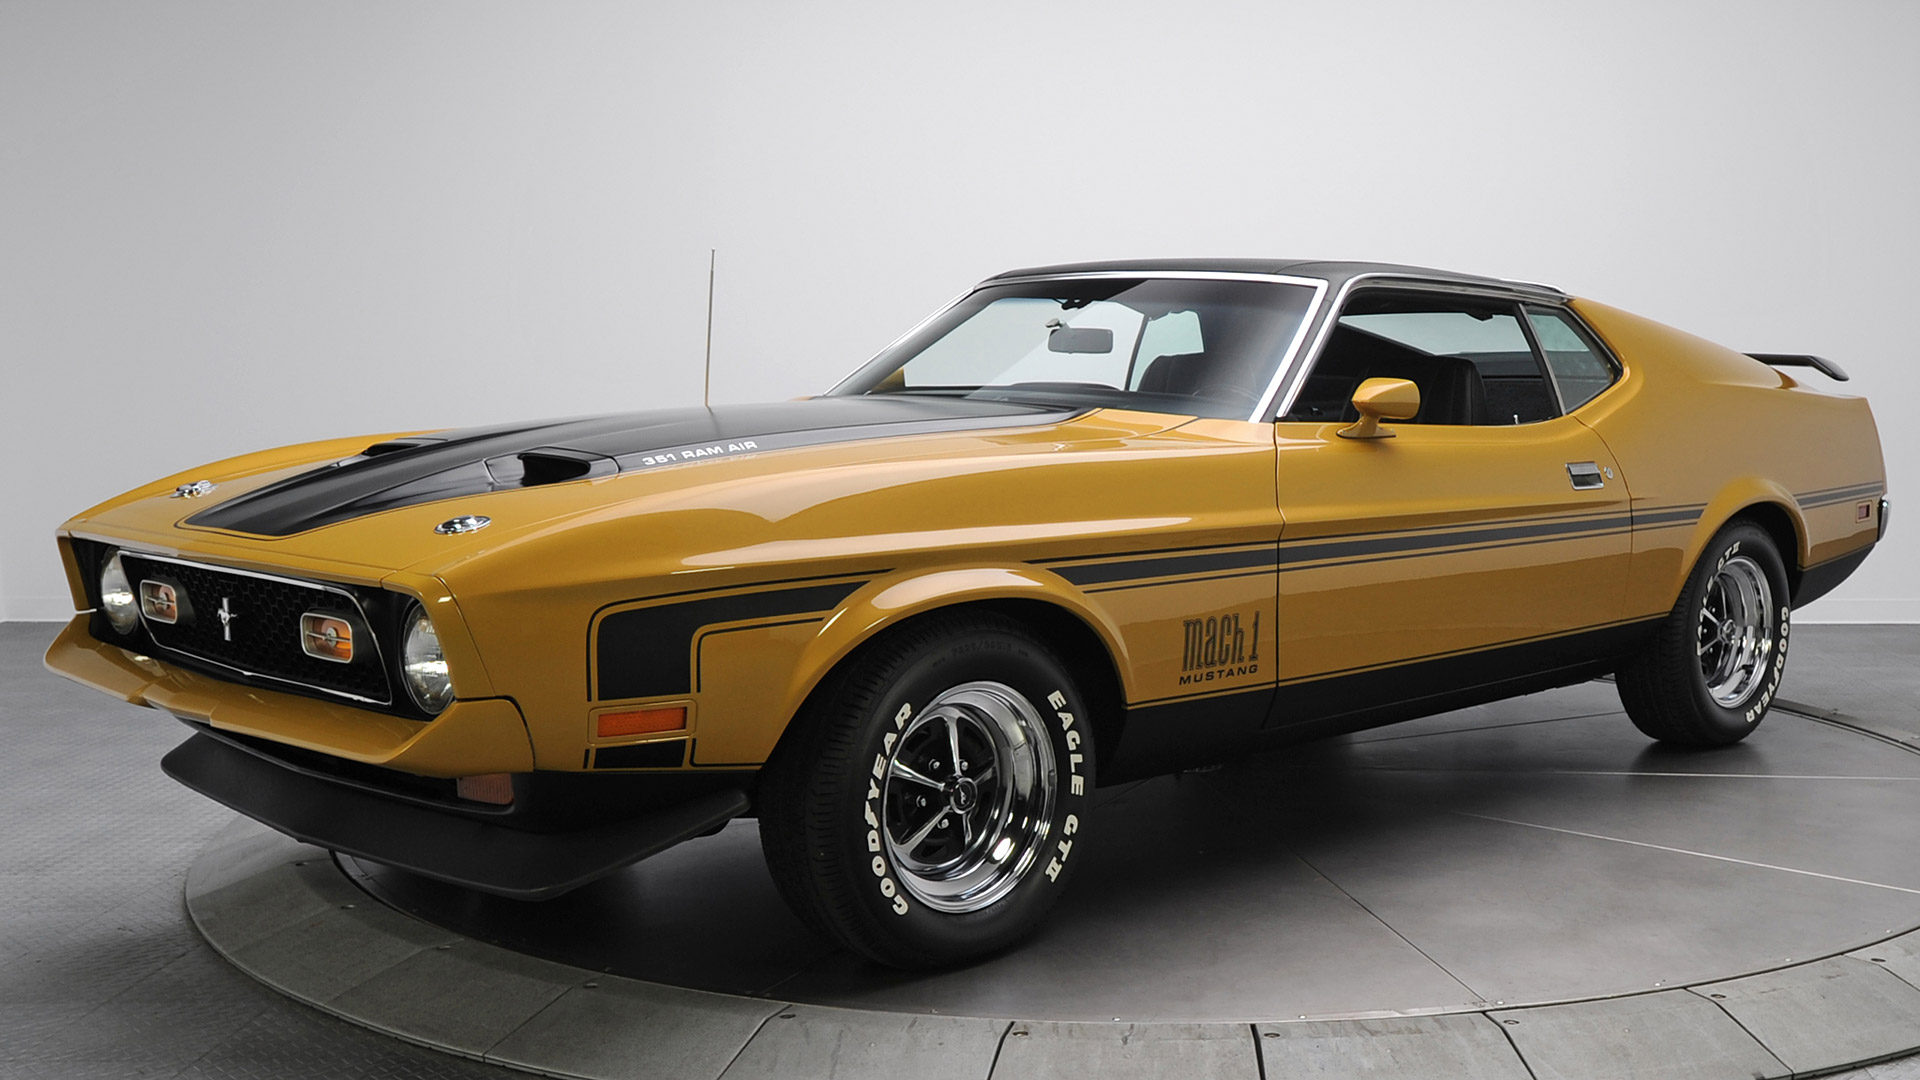 1971 Ford Mustang Mach 1 V4